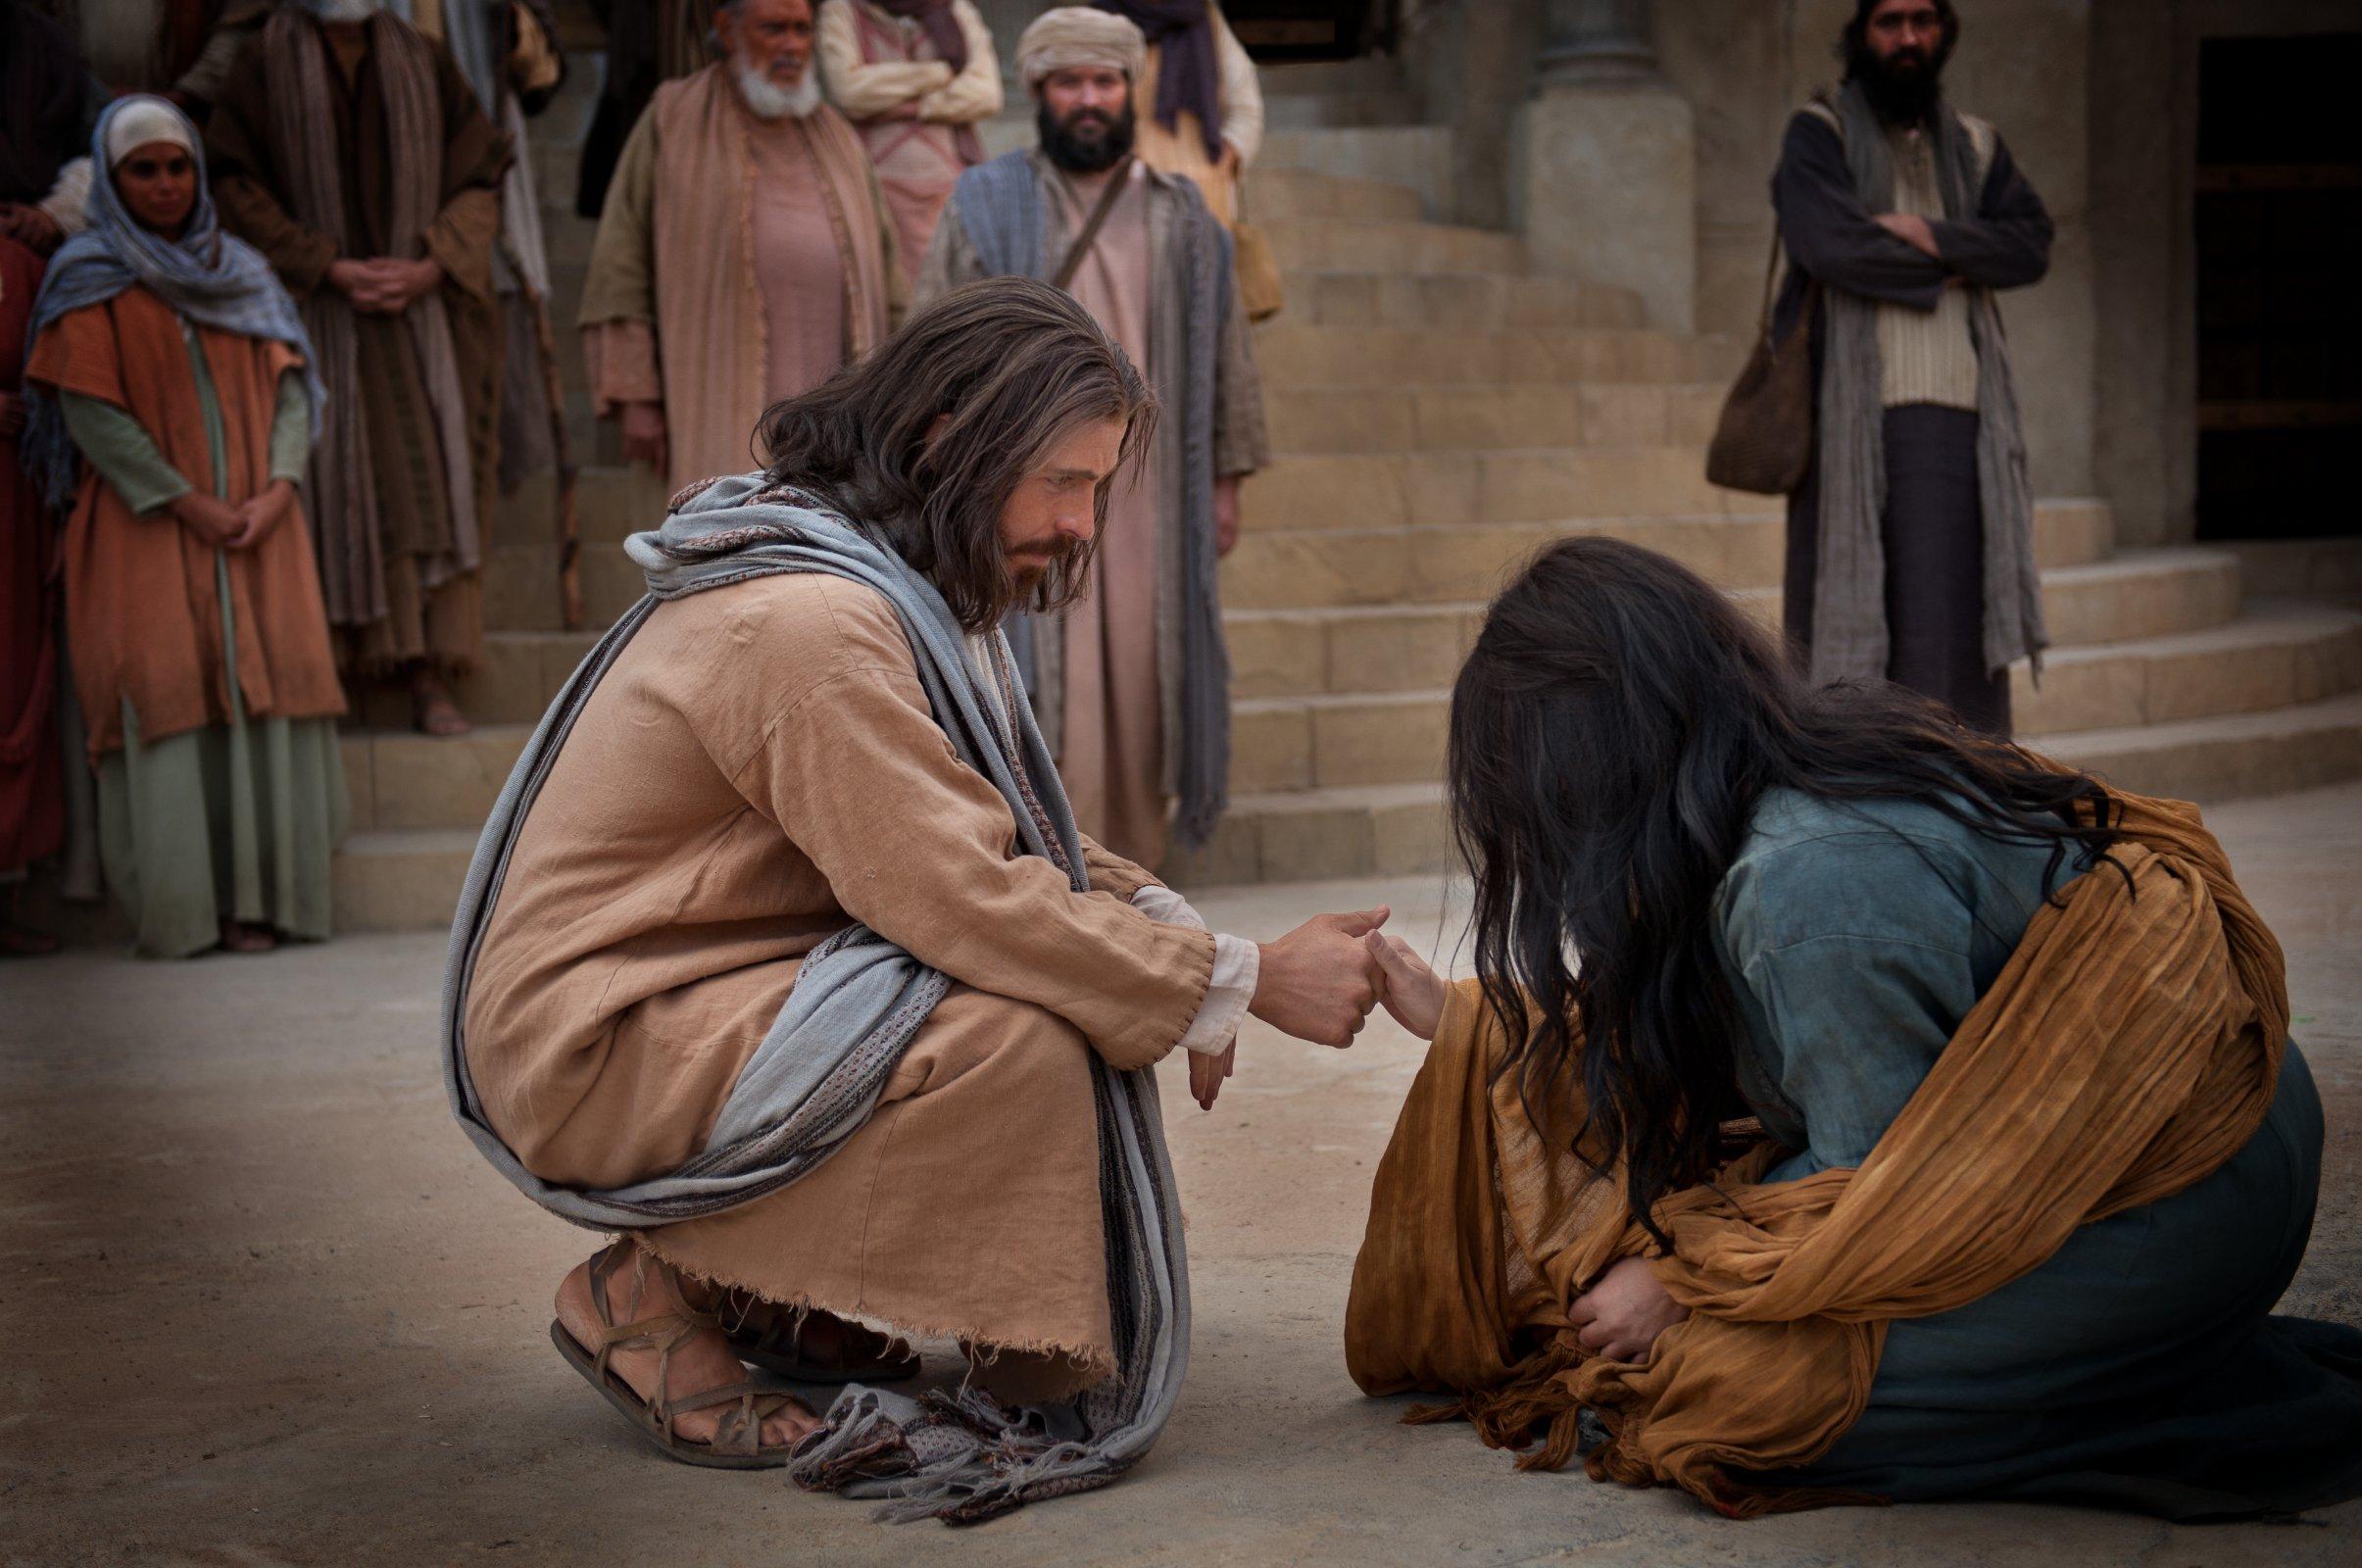 Jesus-woman-adultery-forgiveness-mormon-discipline-john-dehlin-kate-kelly